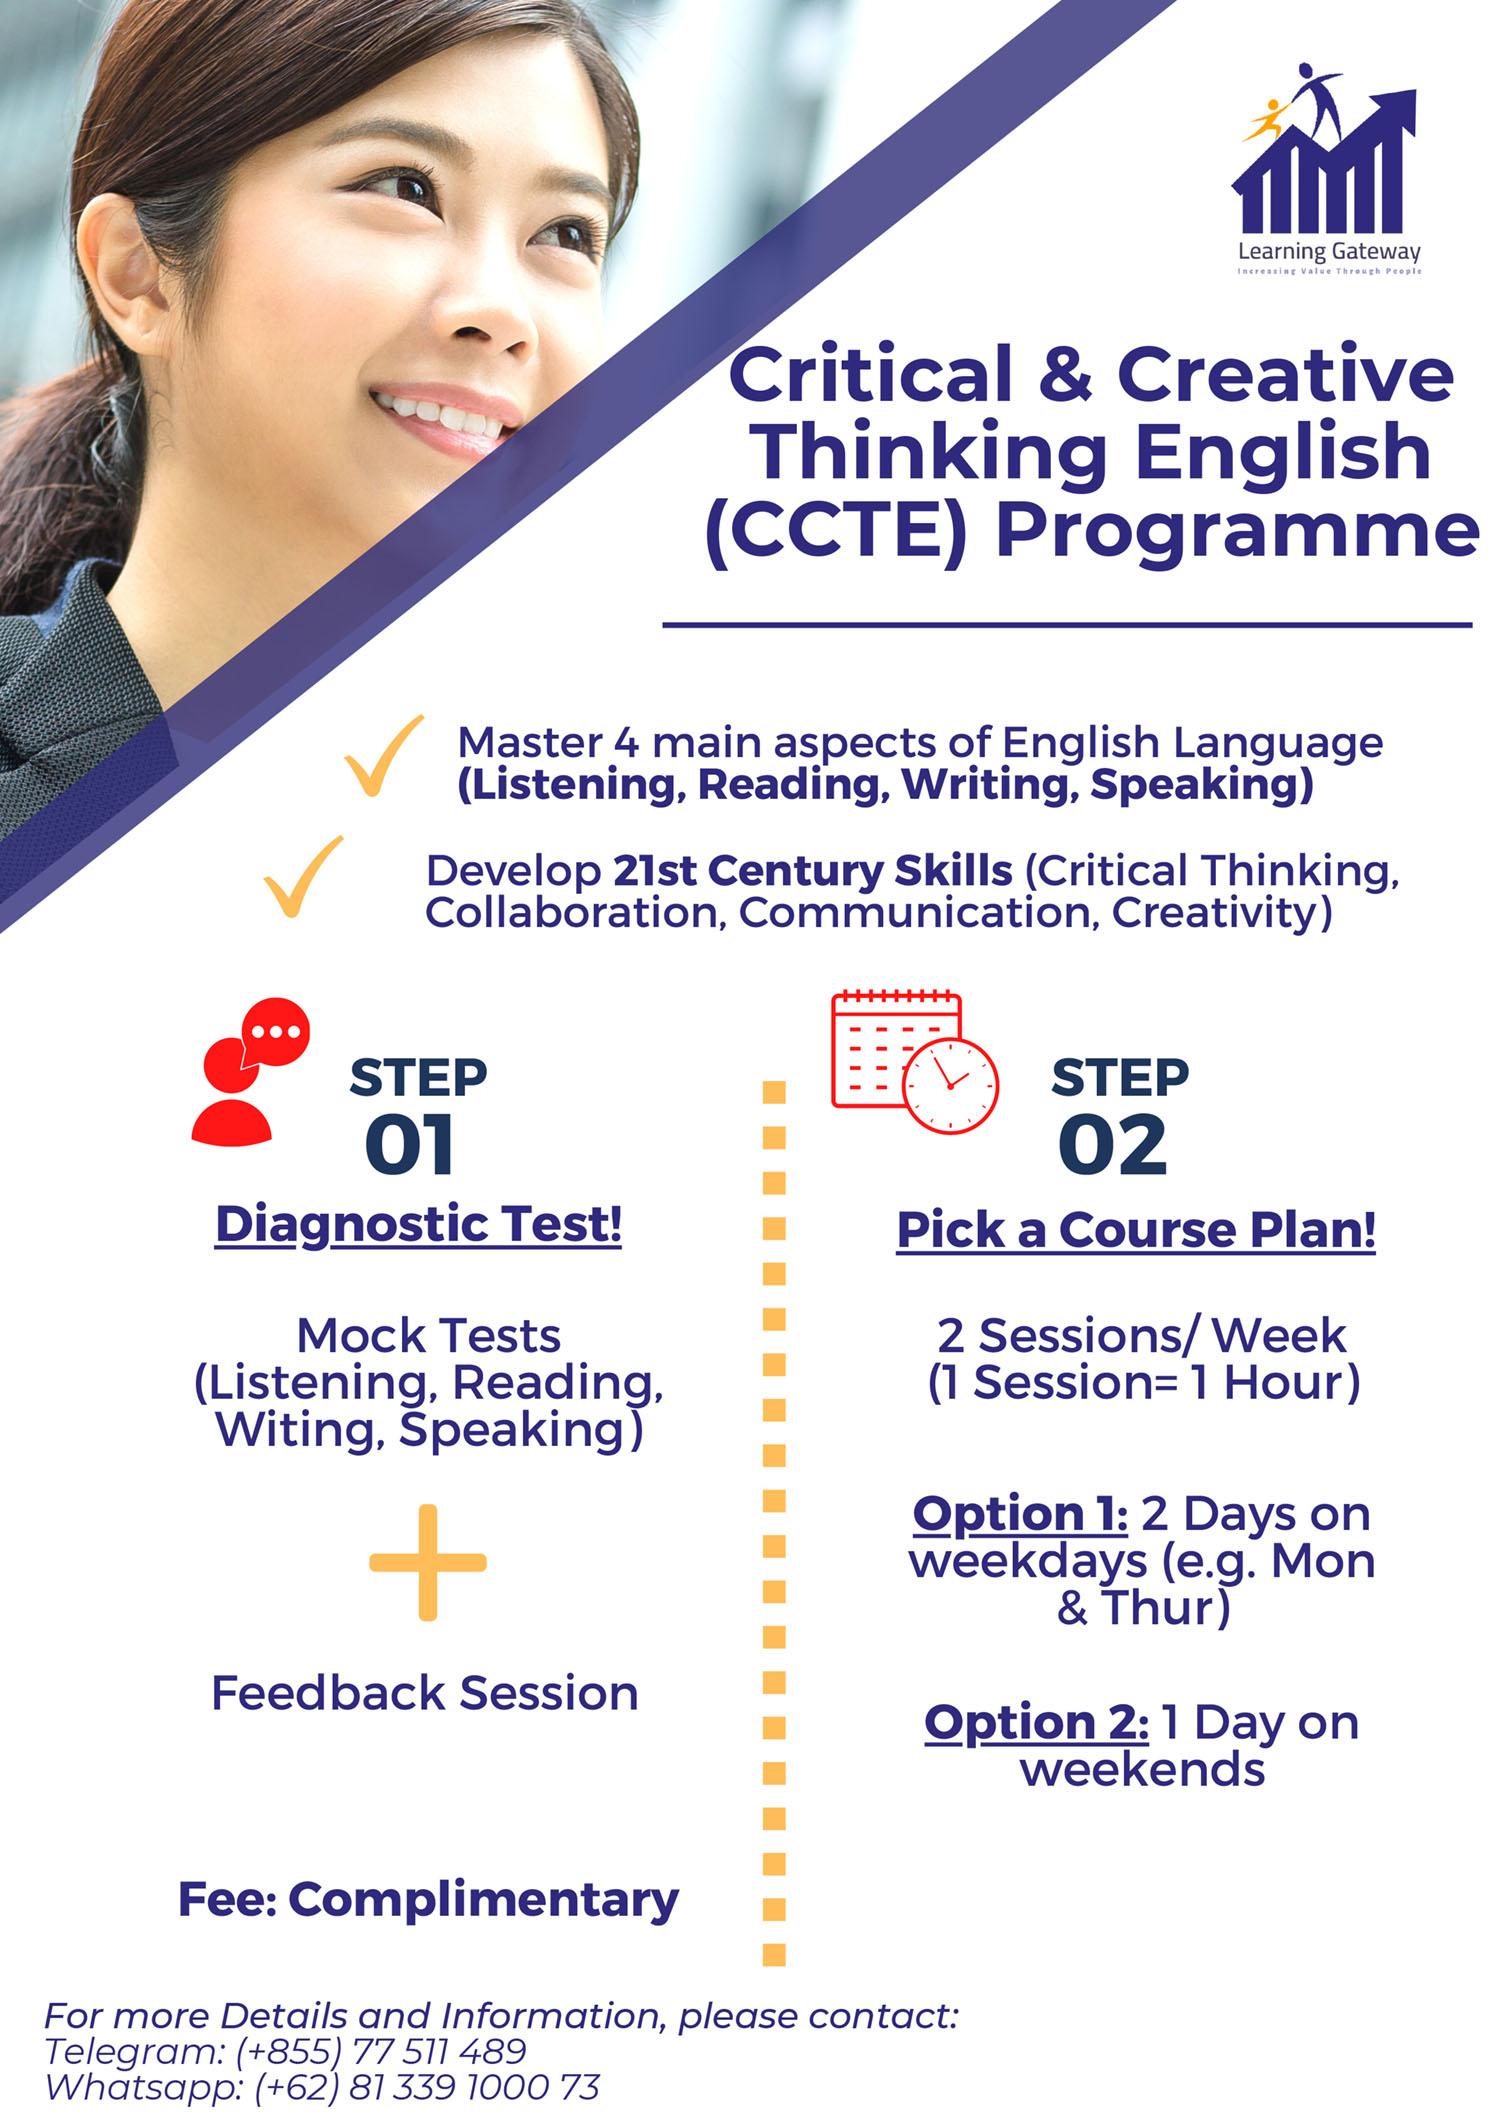 Critical & Creative Thinking English Programme